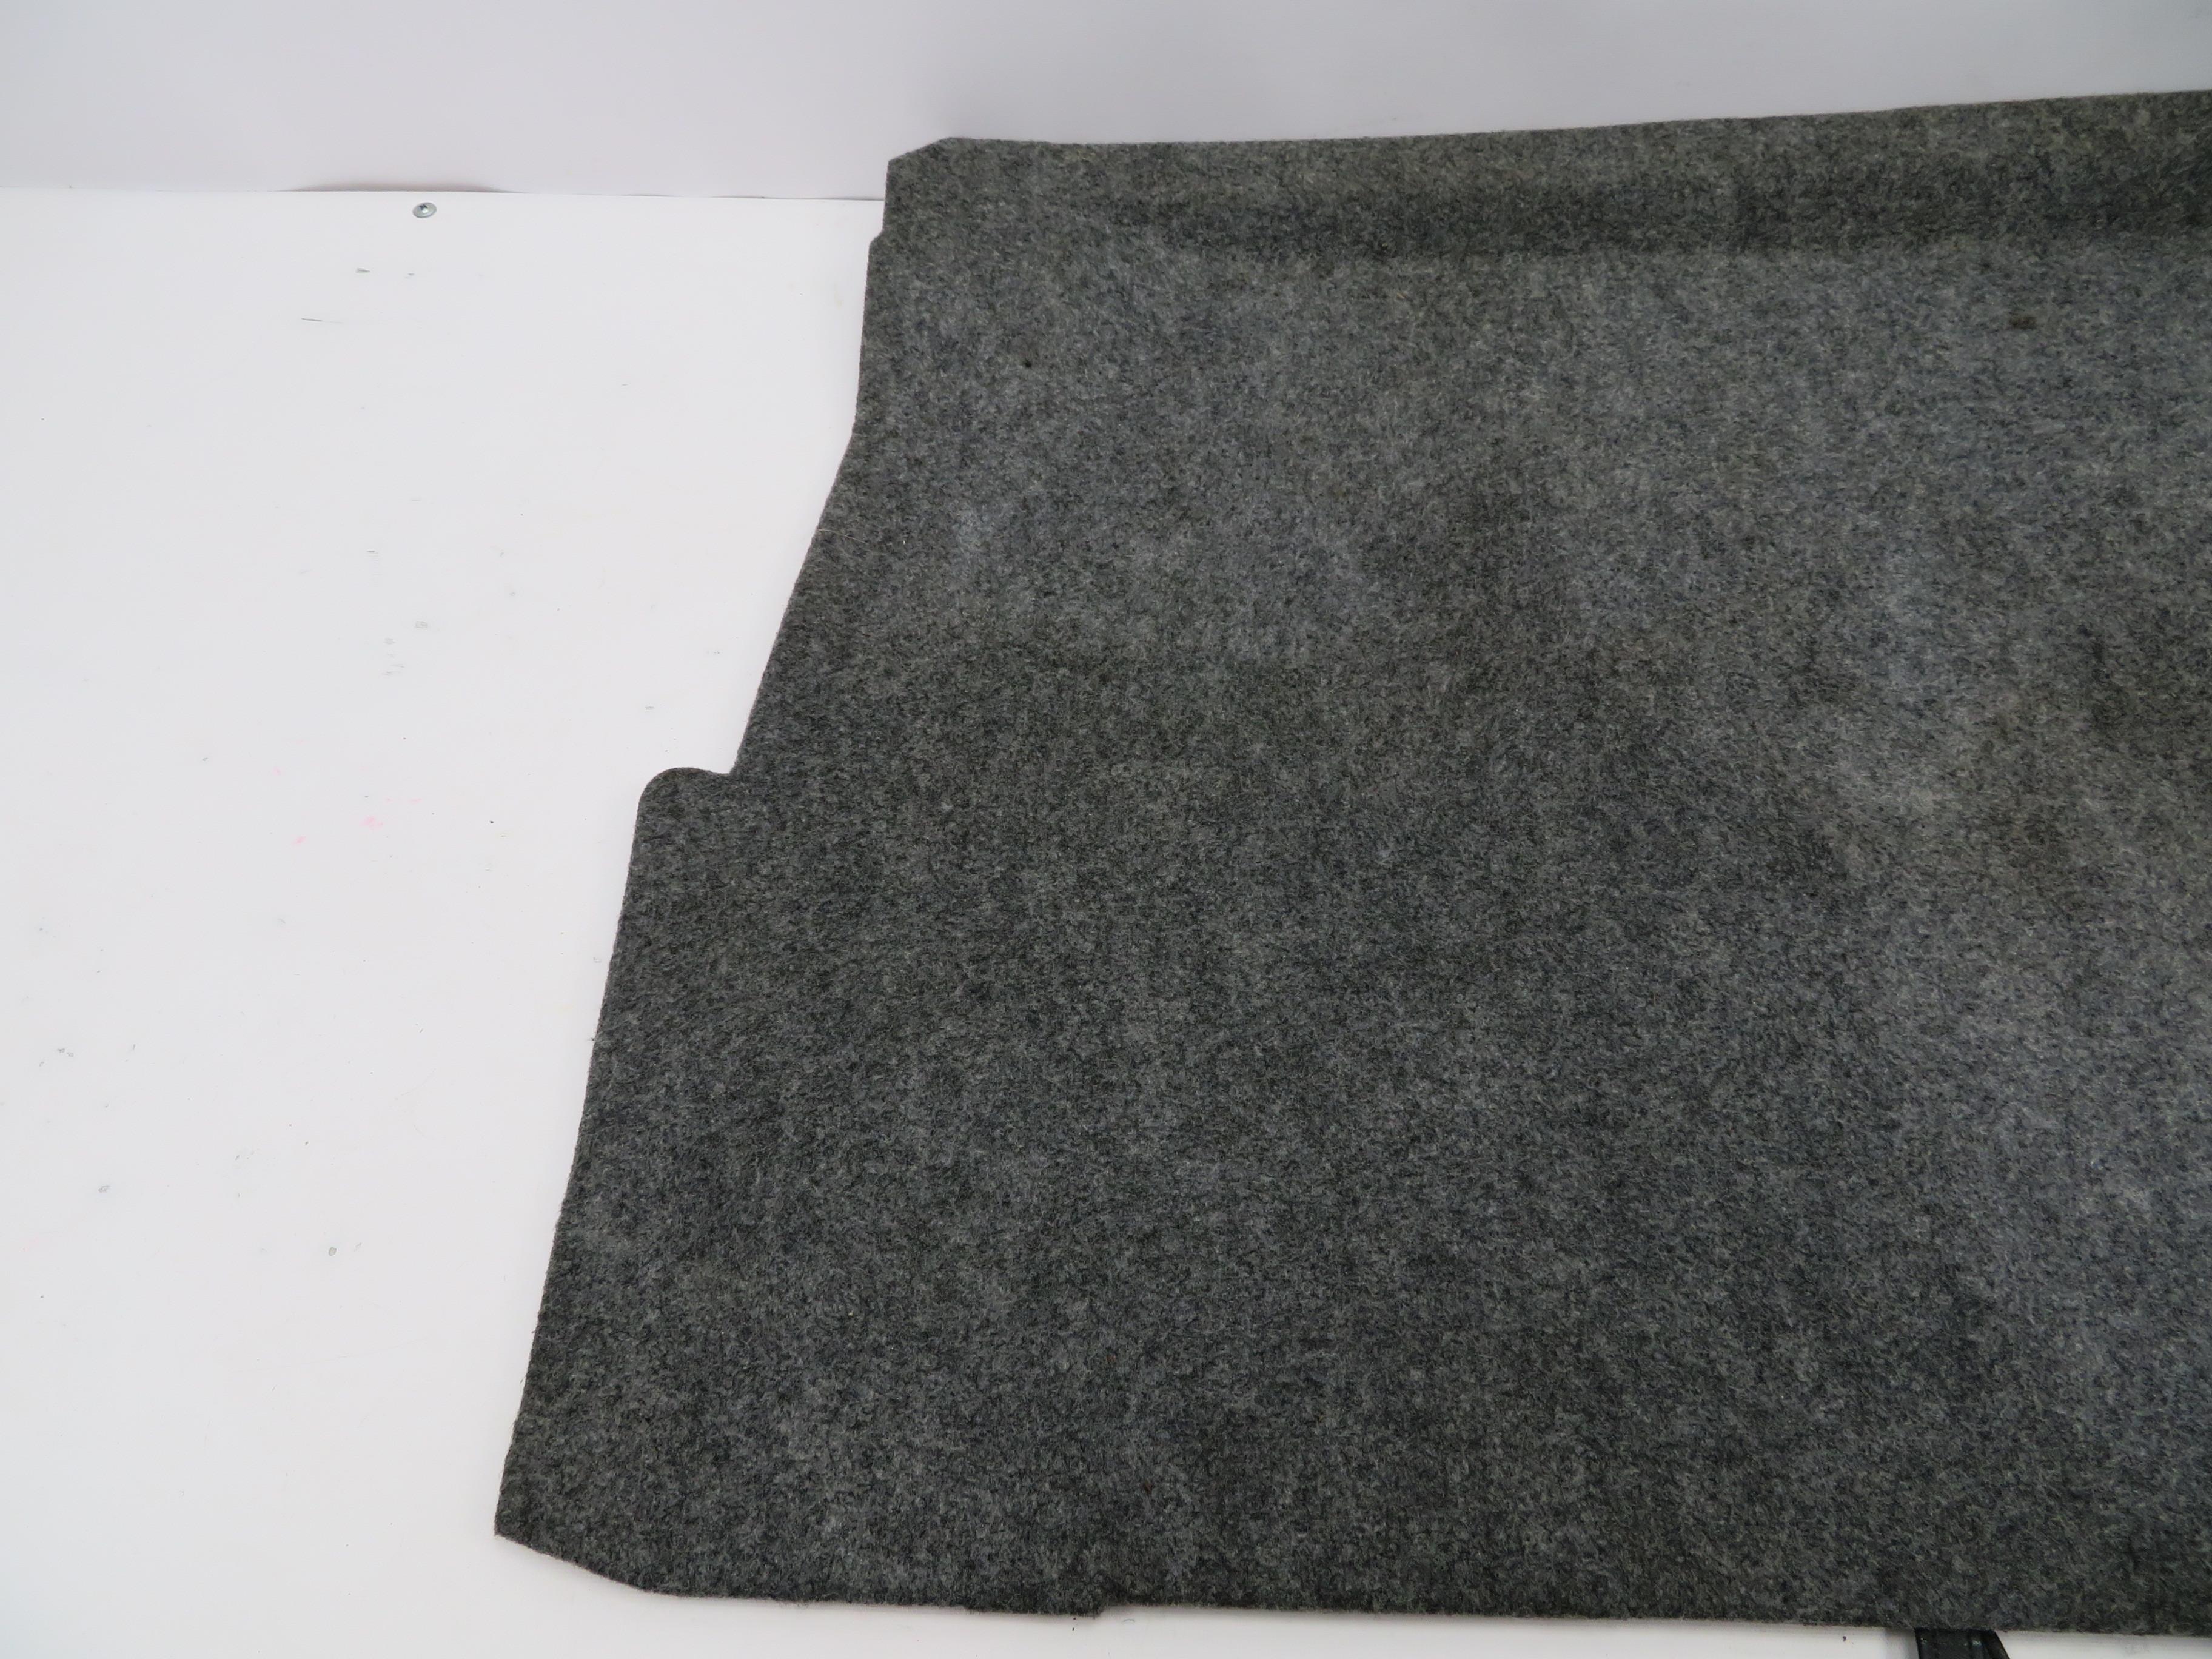 01 Bmw Z3 Roadster E36 1064 Trunk Floor Board Lining Carpet Mat